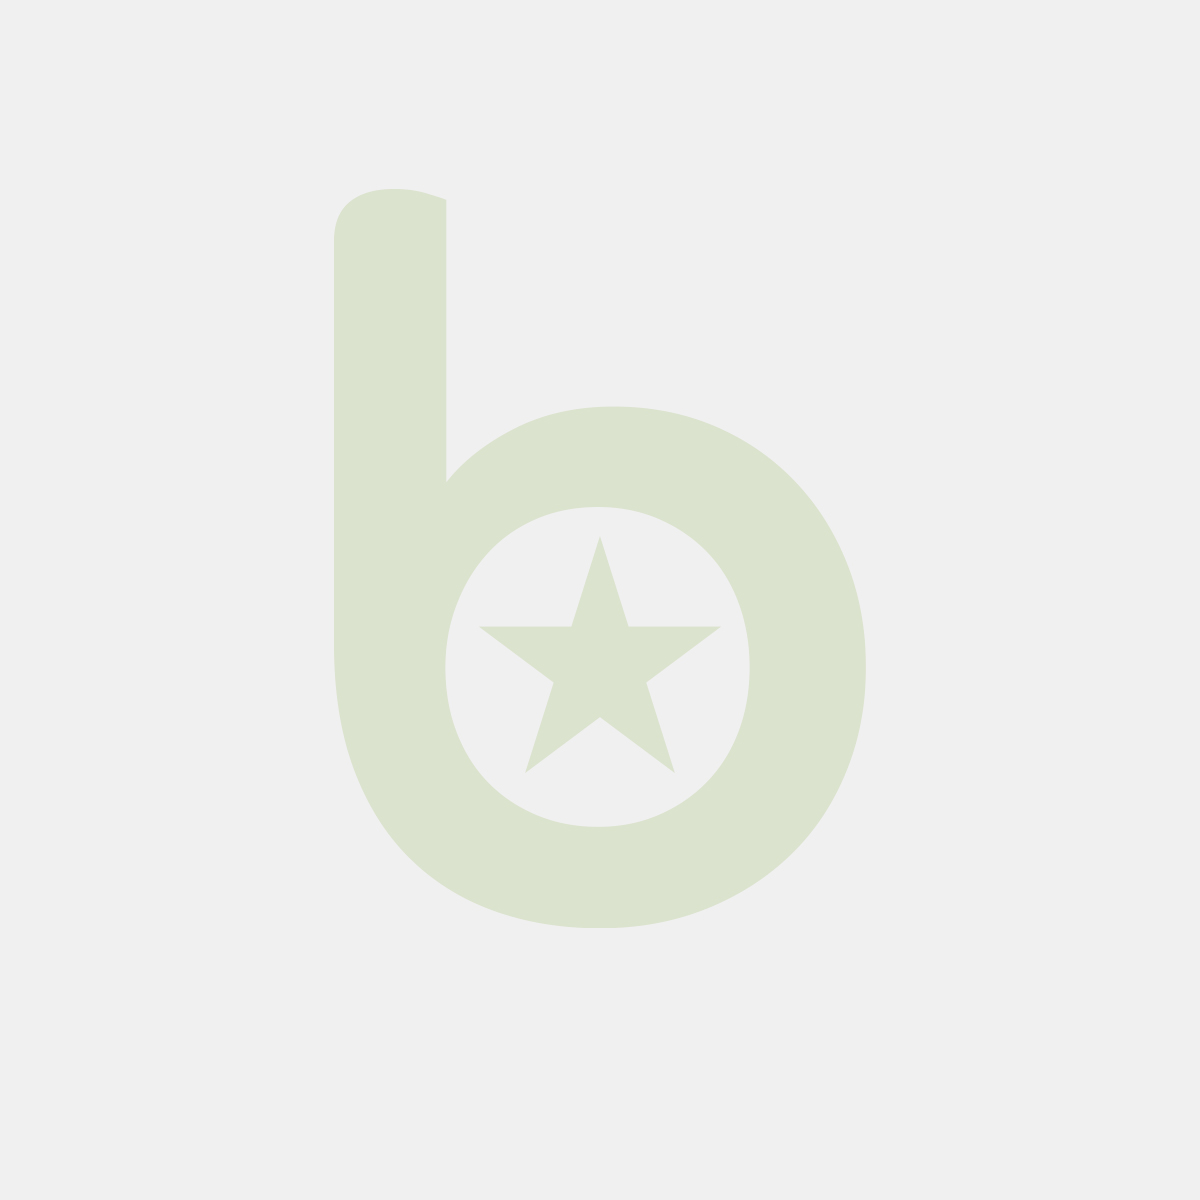 Nadstawa chłodnicza GN 1/3 4xGN 1/3